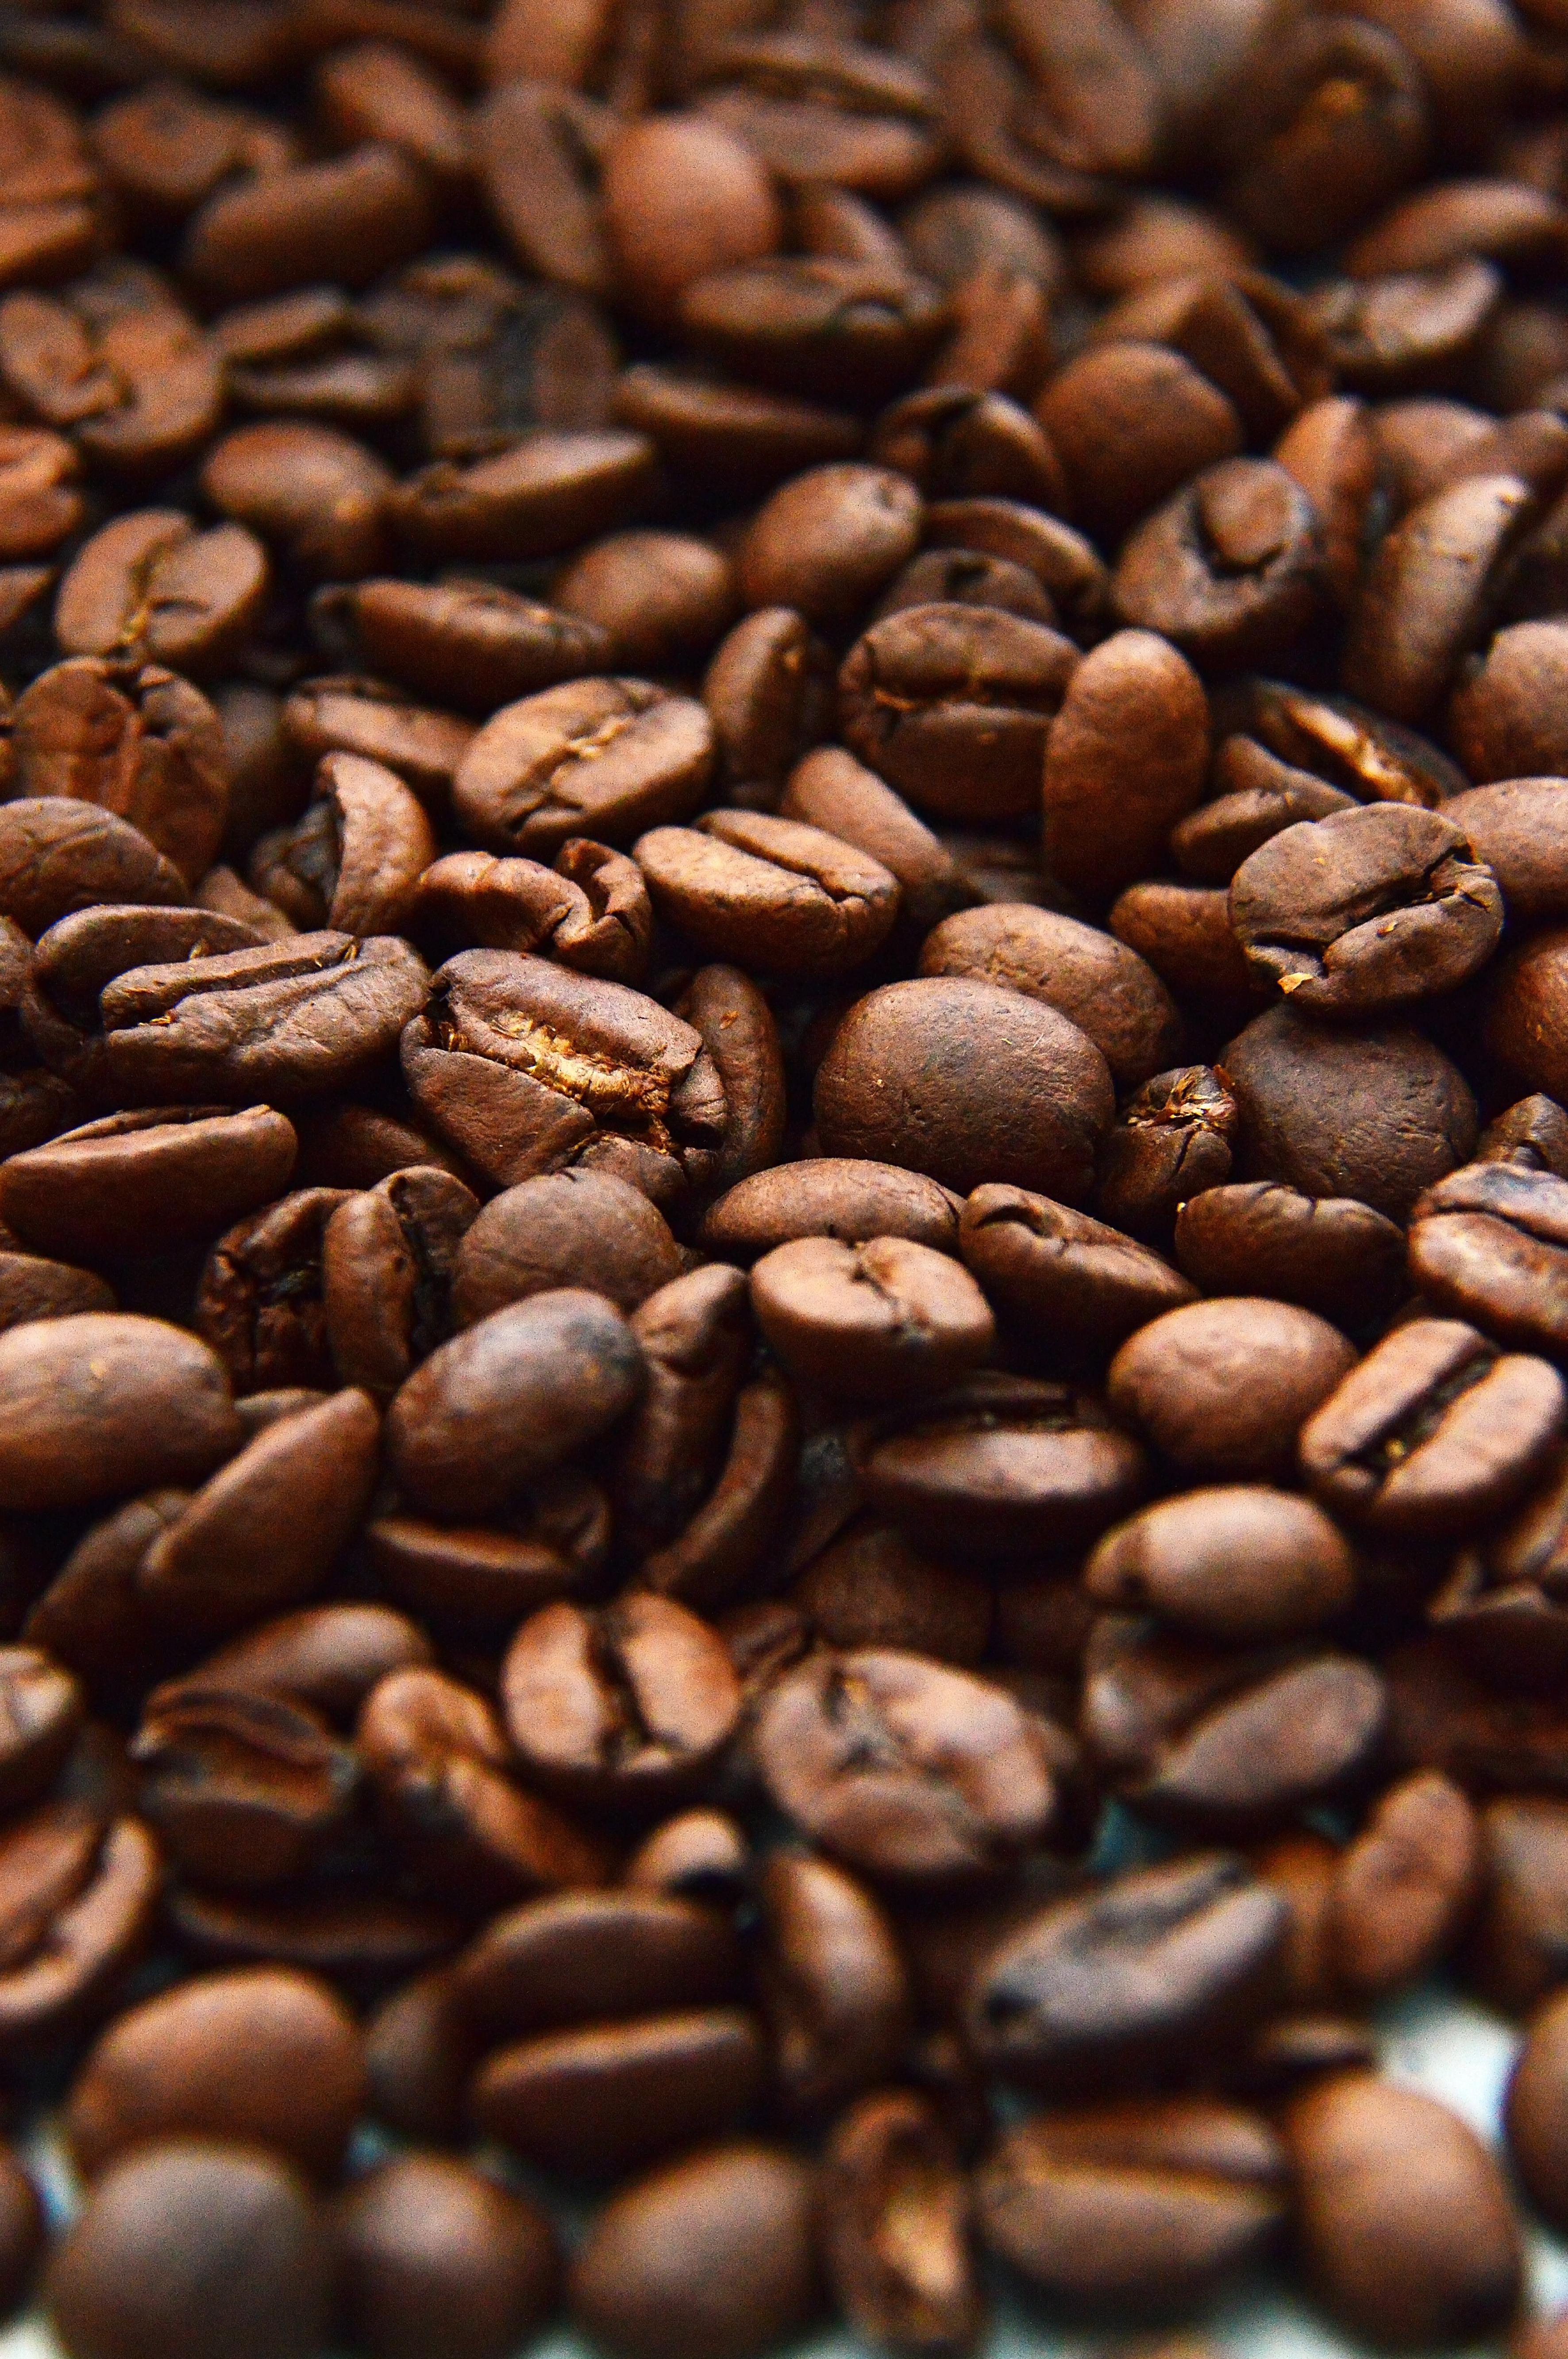 Free Images Beans Background Texture Food Brown Espresso Caffeine Drink Aroma Black Grain Roasted Cafe Mocha White Closeup Energy Dark